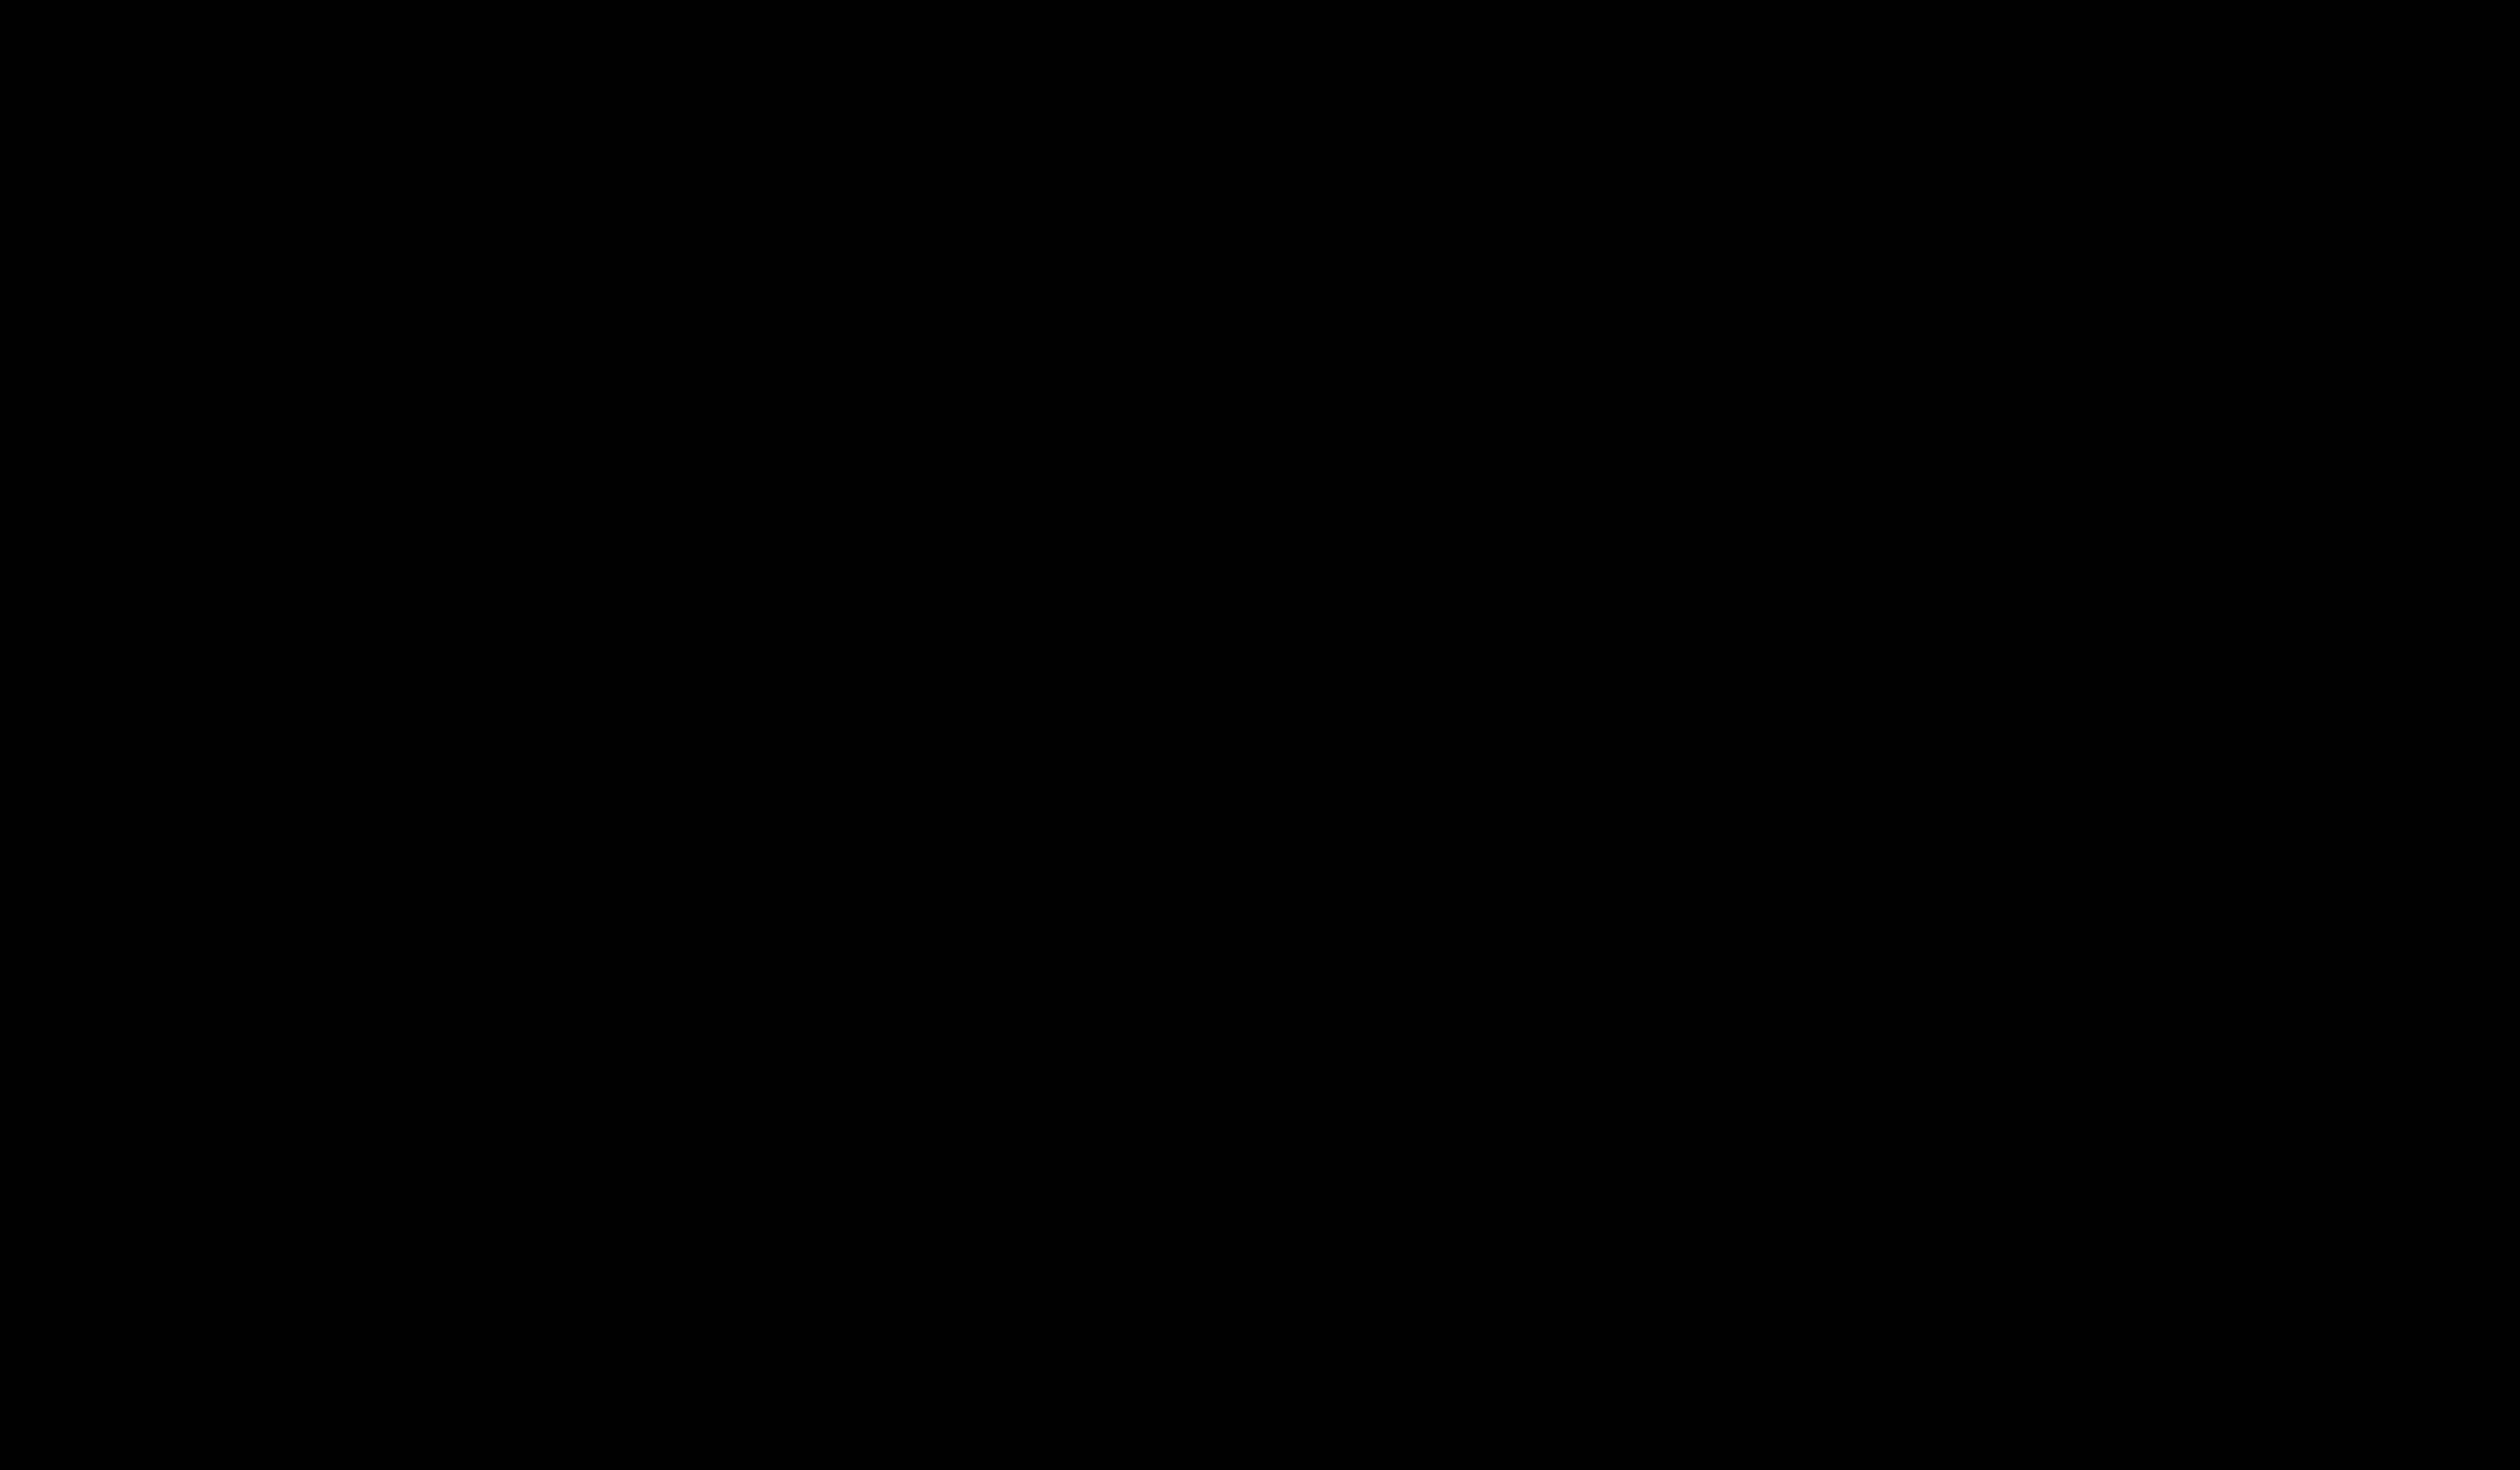 Solid Black Background Tumblr   clipartsgramcom 6250x3646